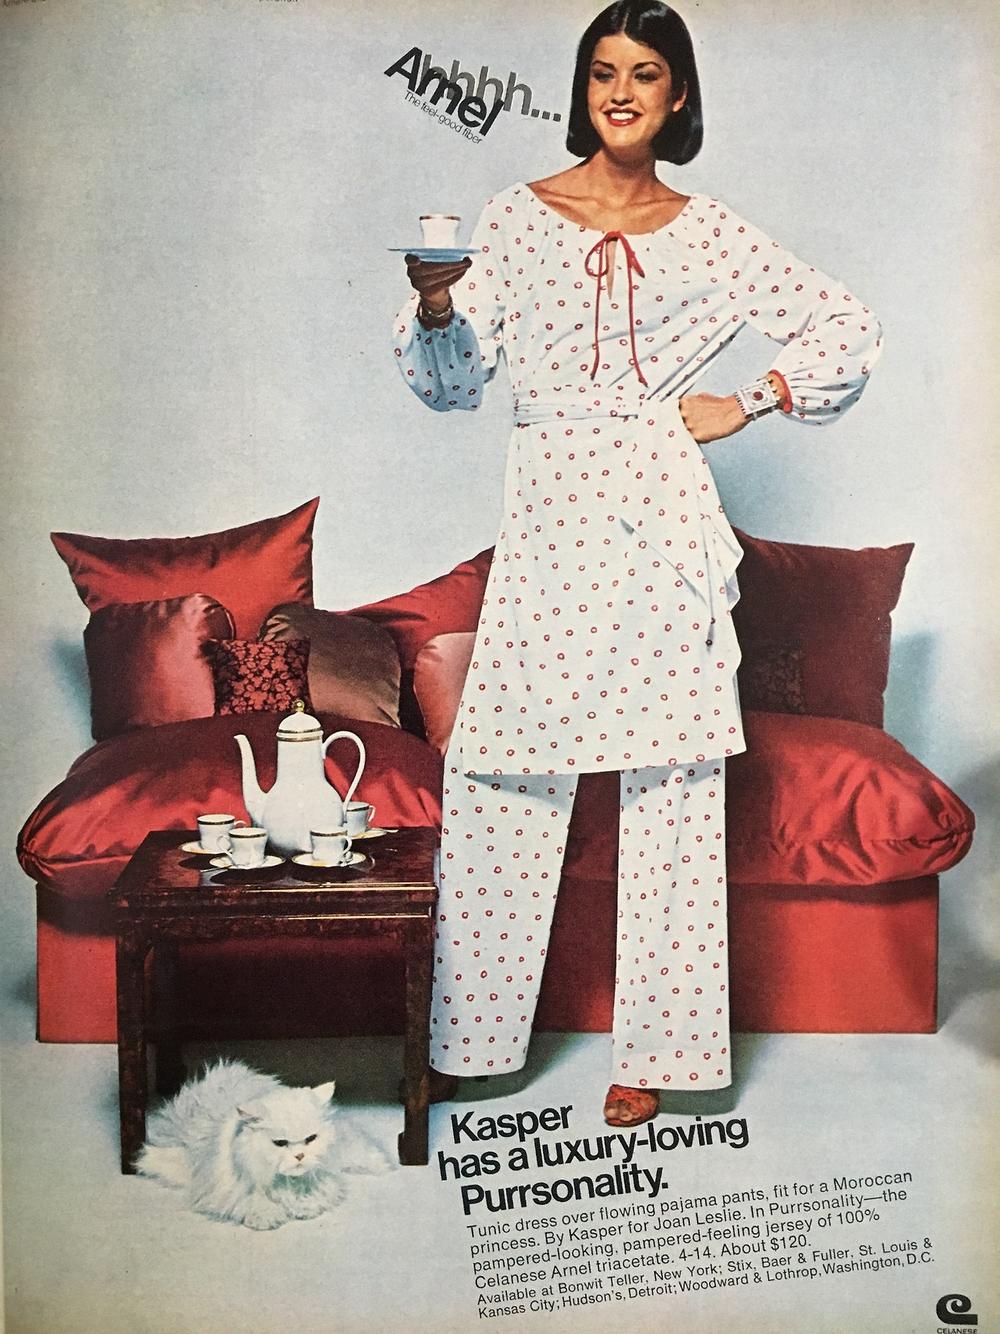 Kasper. Vogue. May 1976.